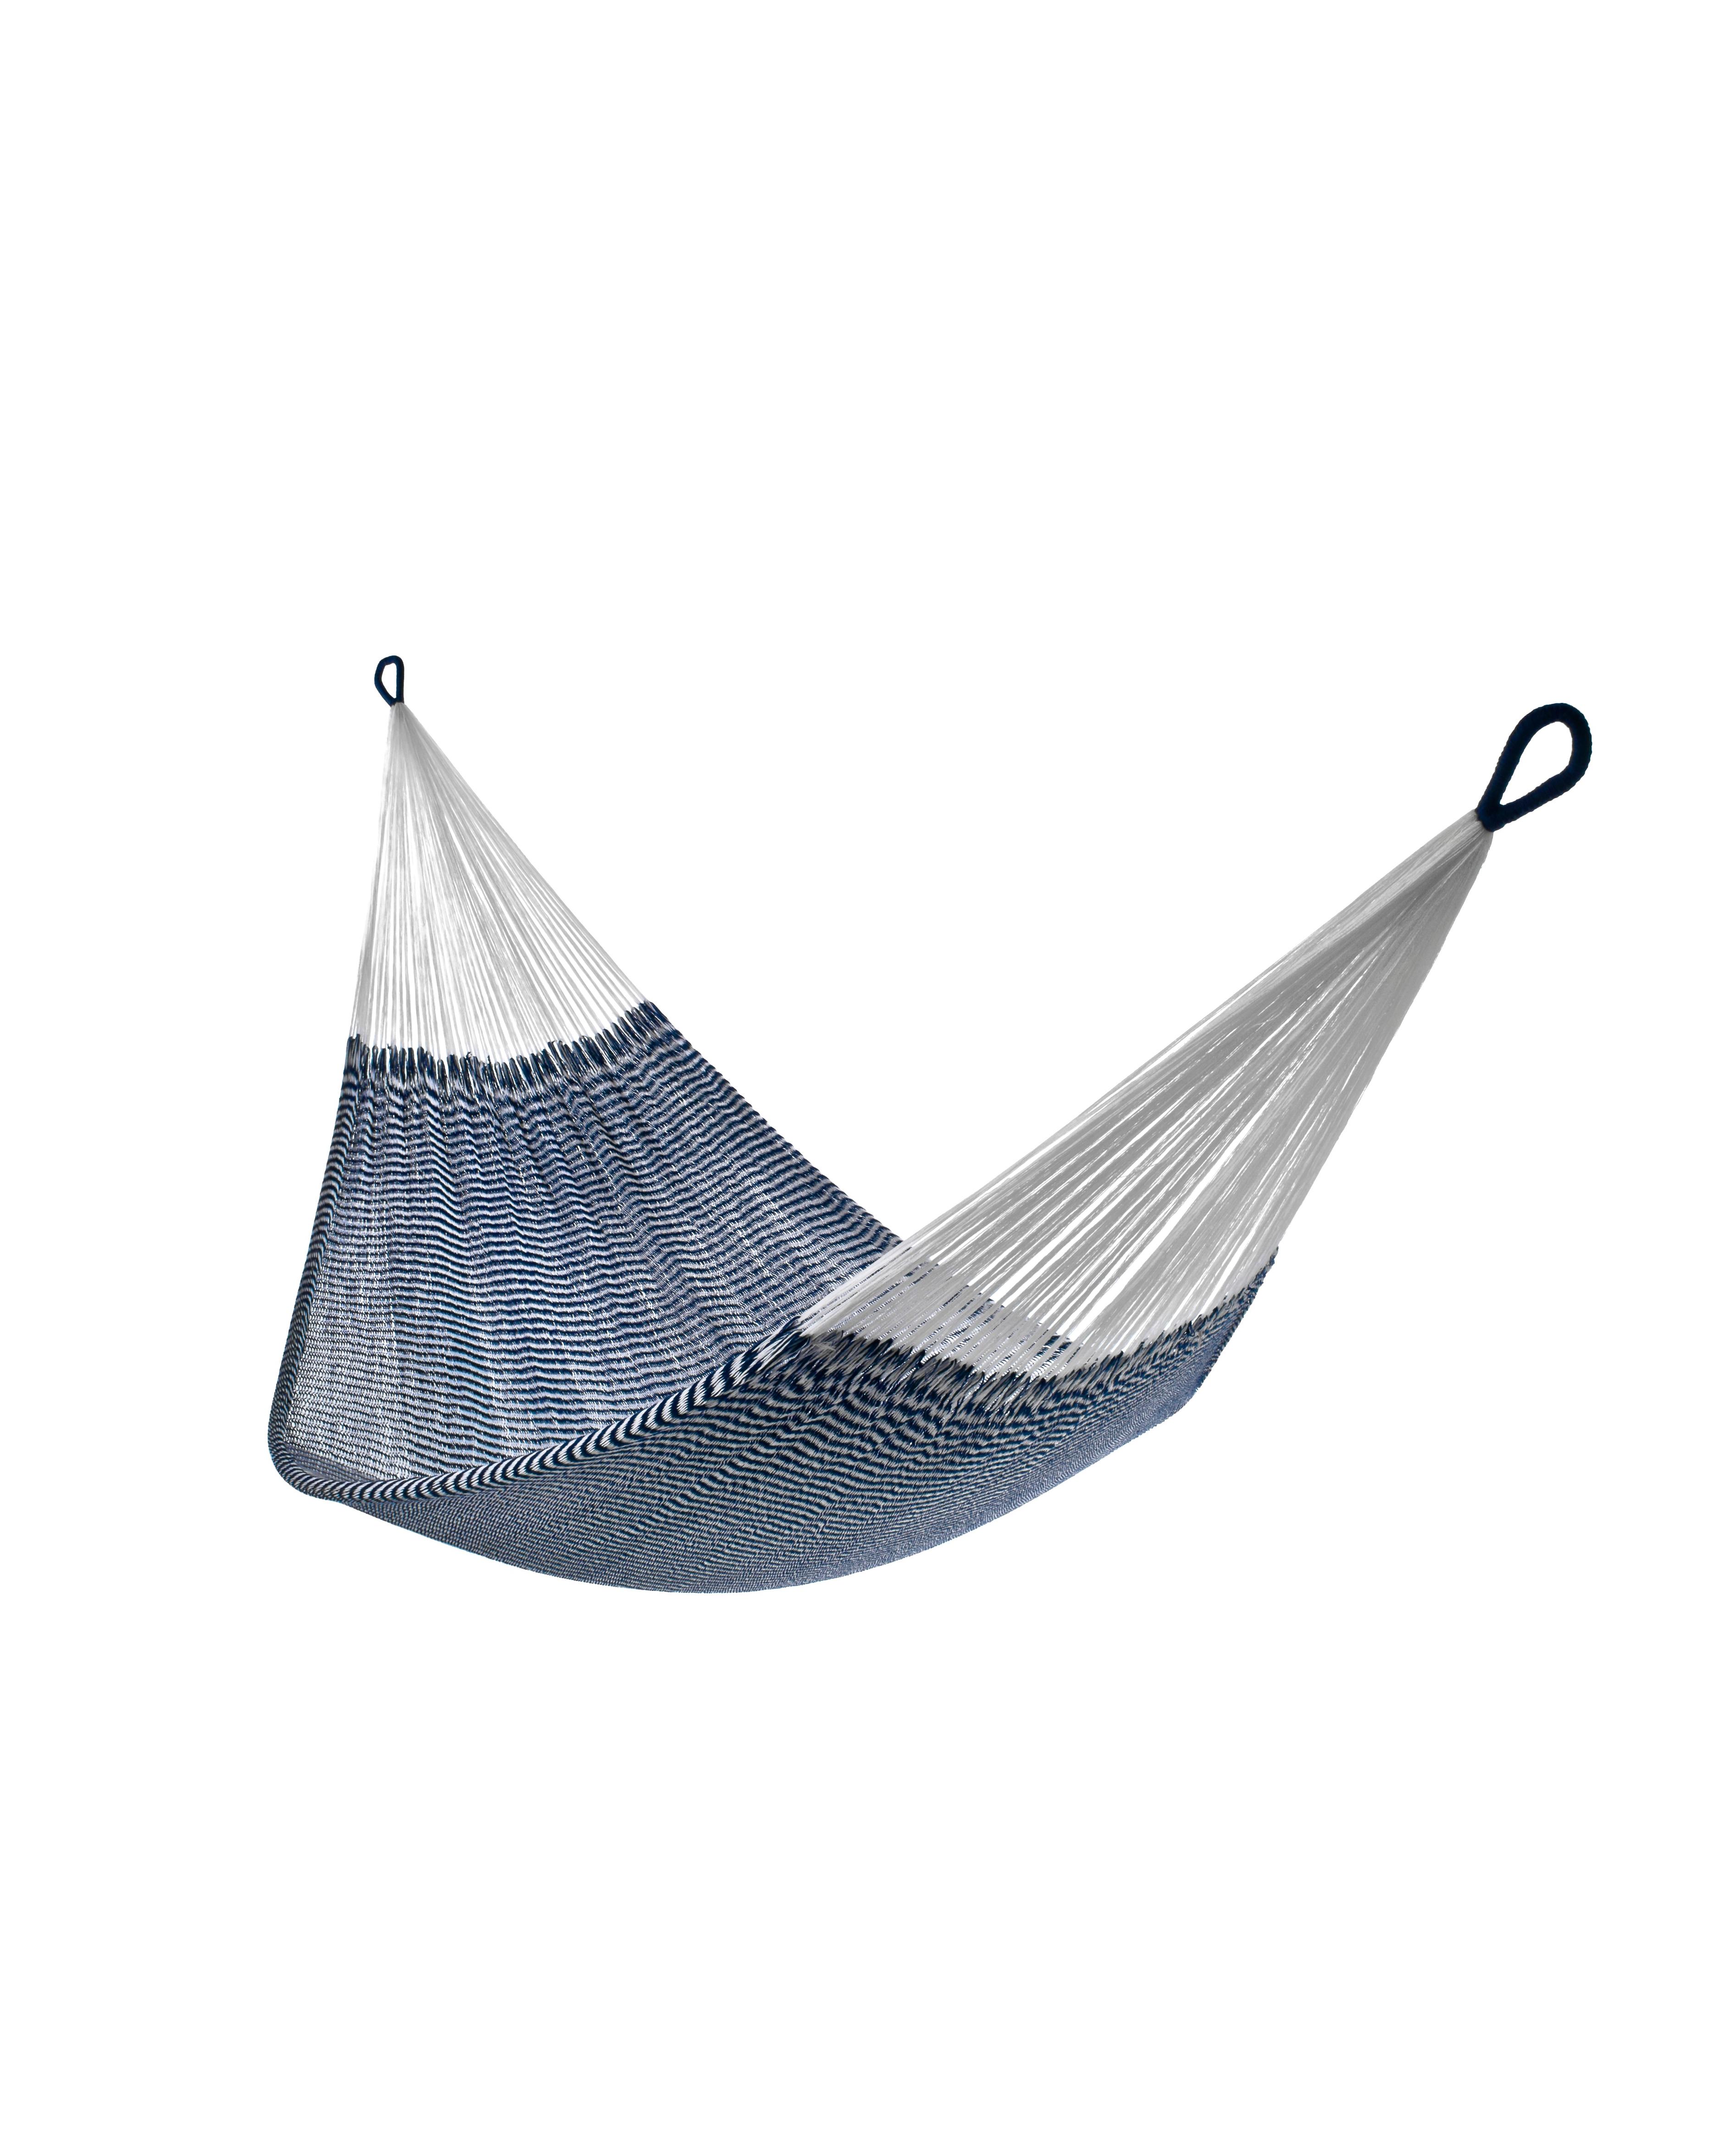 outdoor-registry-items-yellow-leaf-hammock-0814.jpg